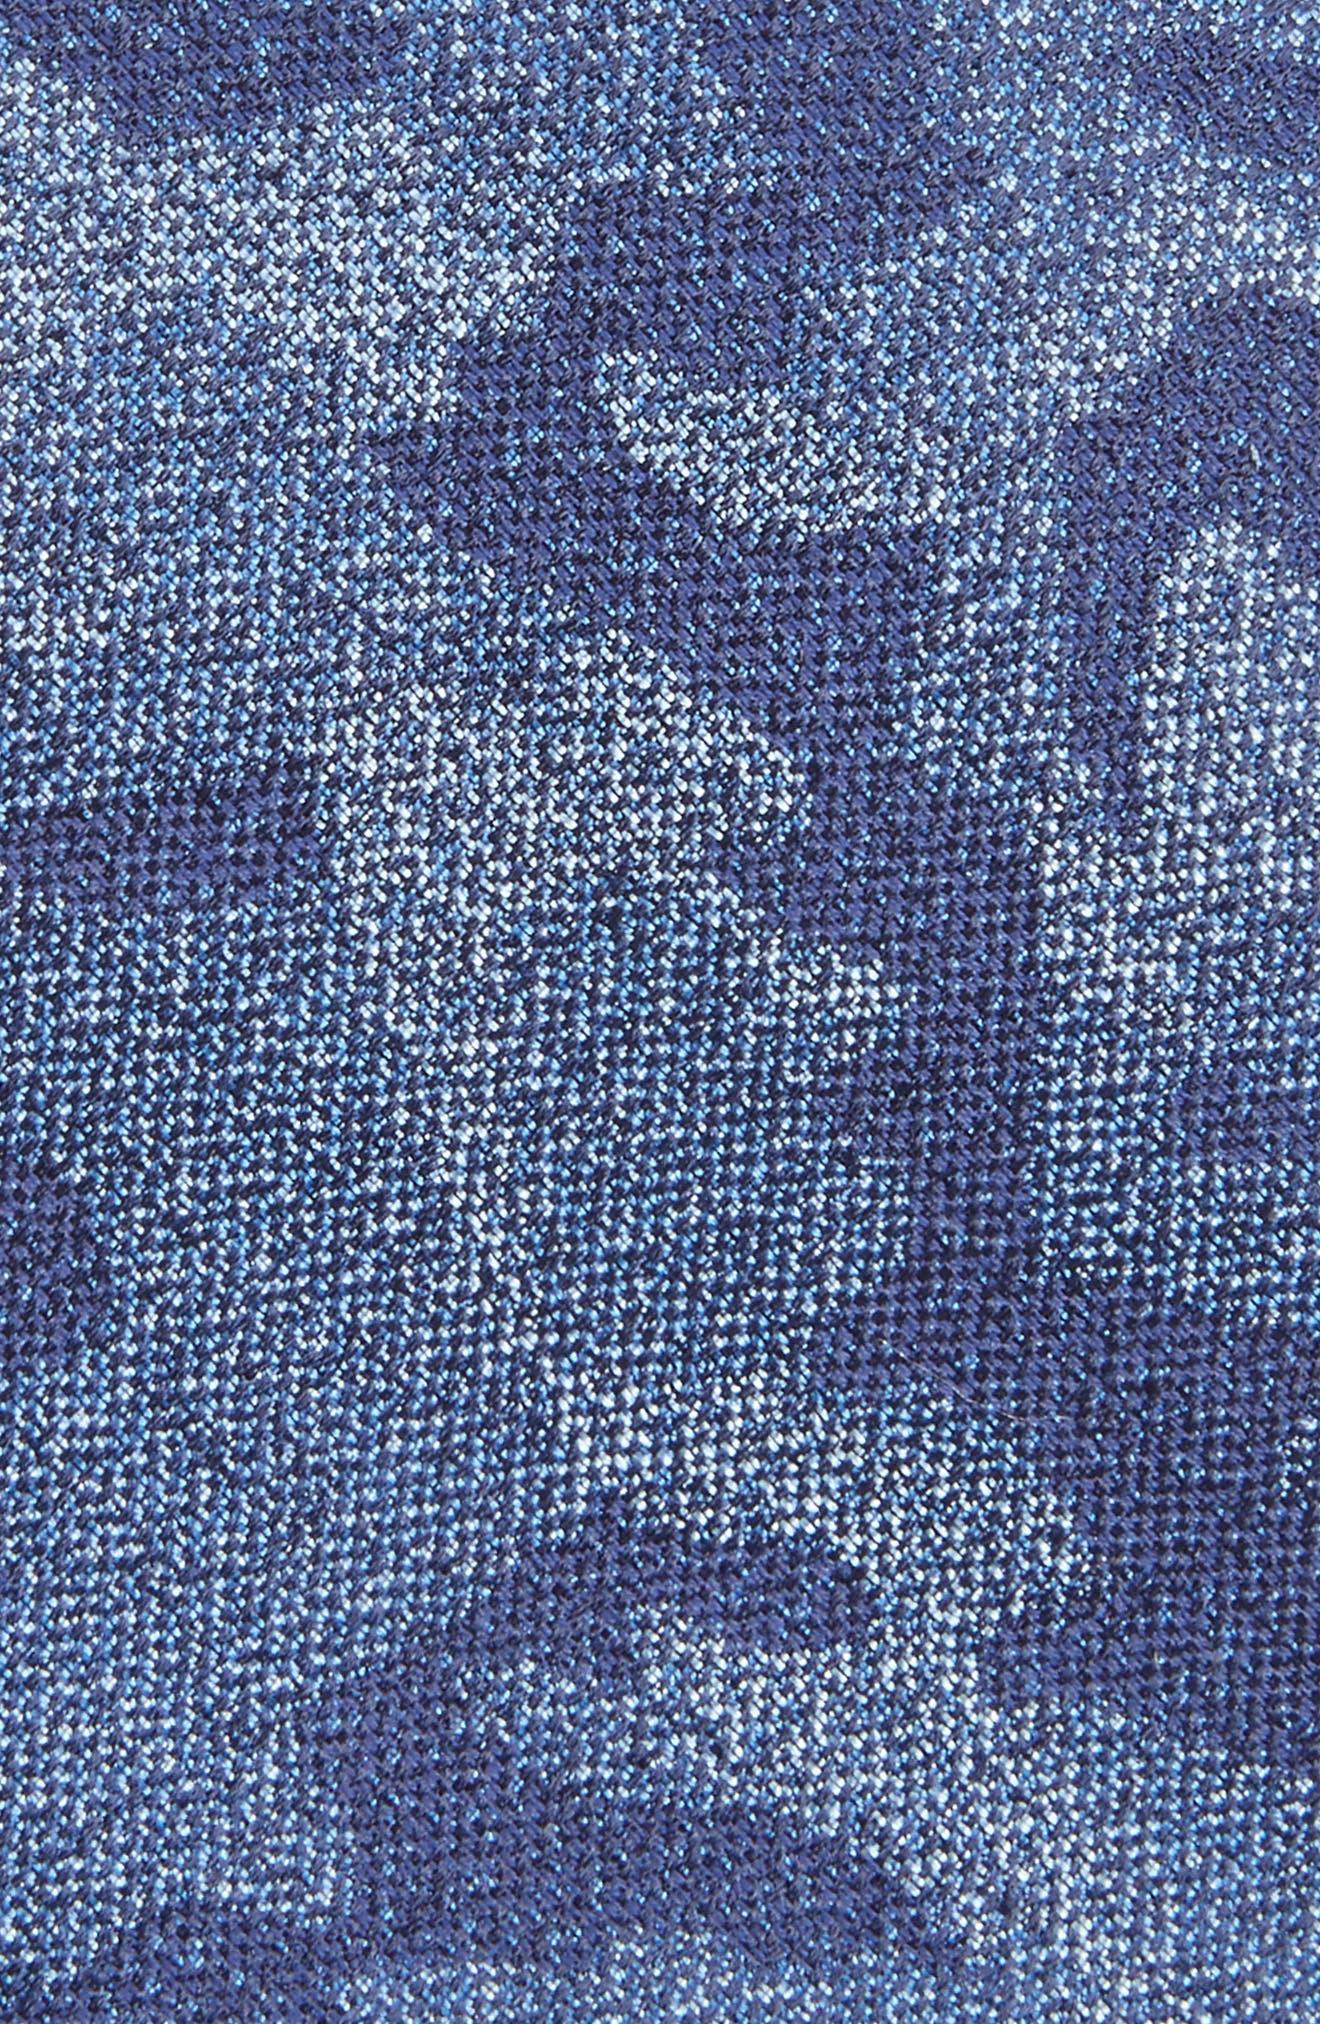 Alternate Image 2  - Calibrate Morada Camo Silk & Cotton Tie